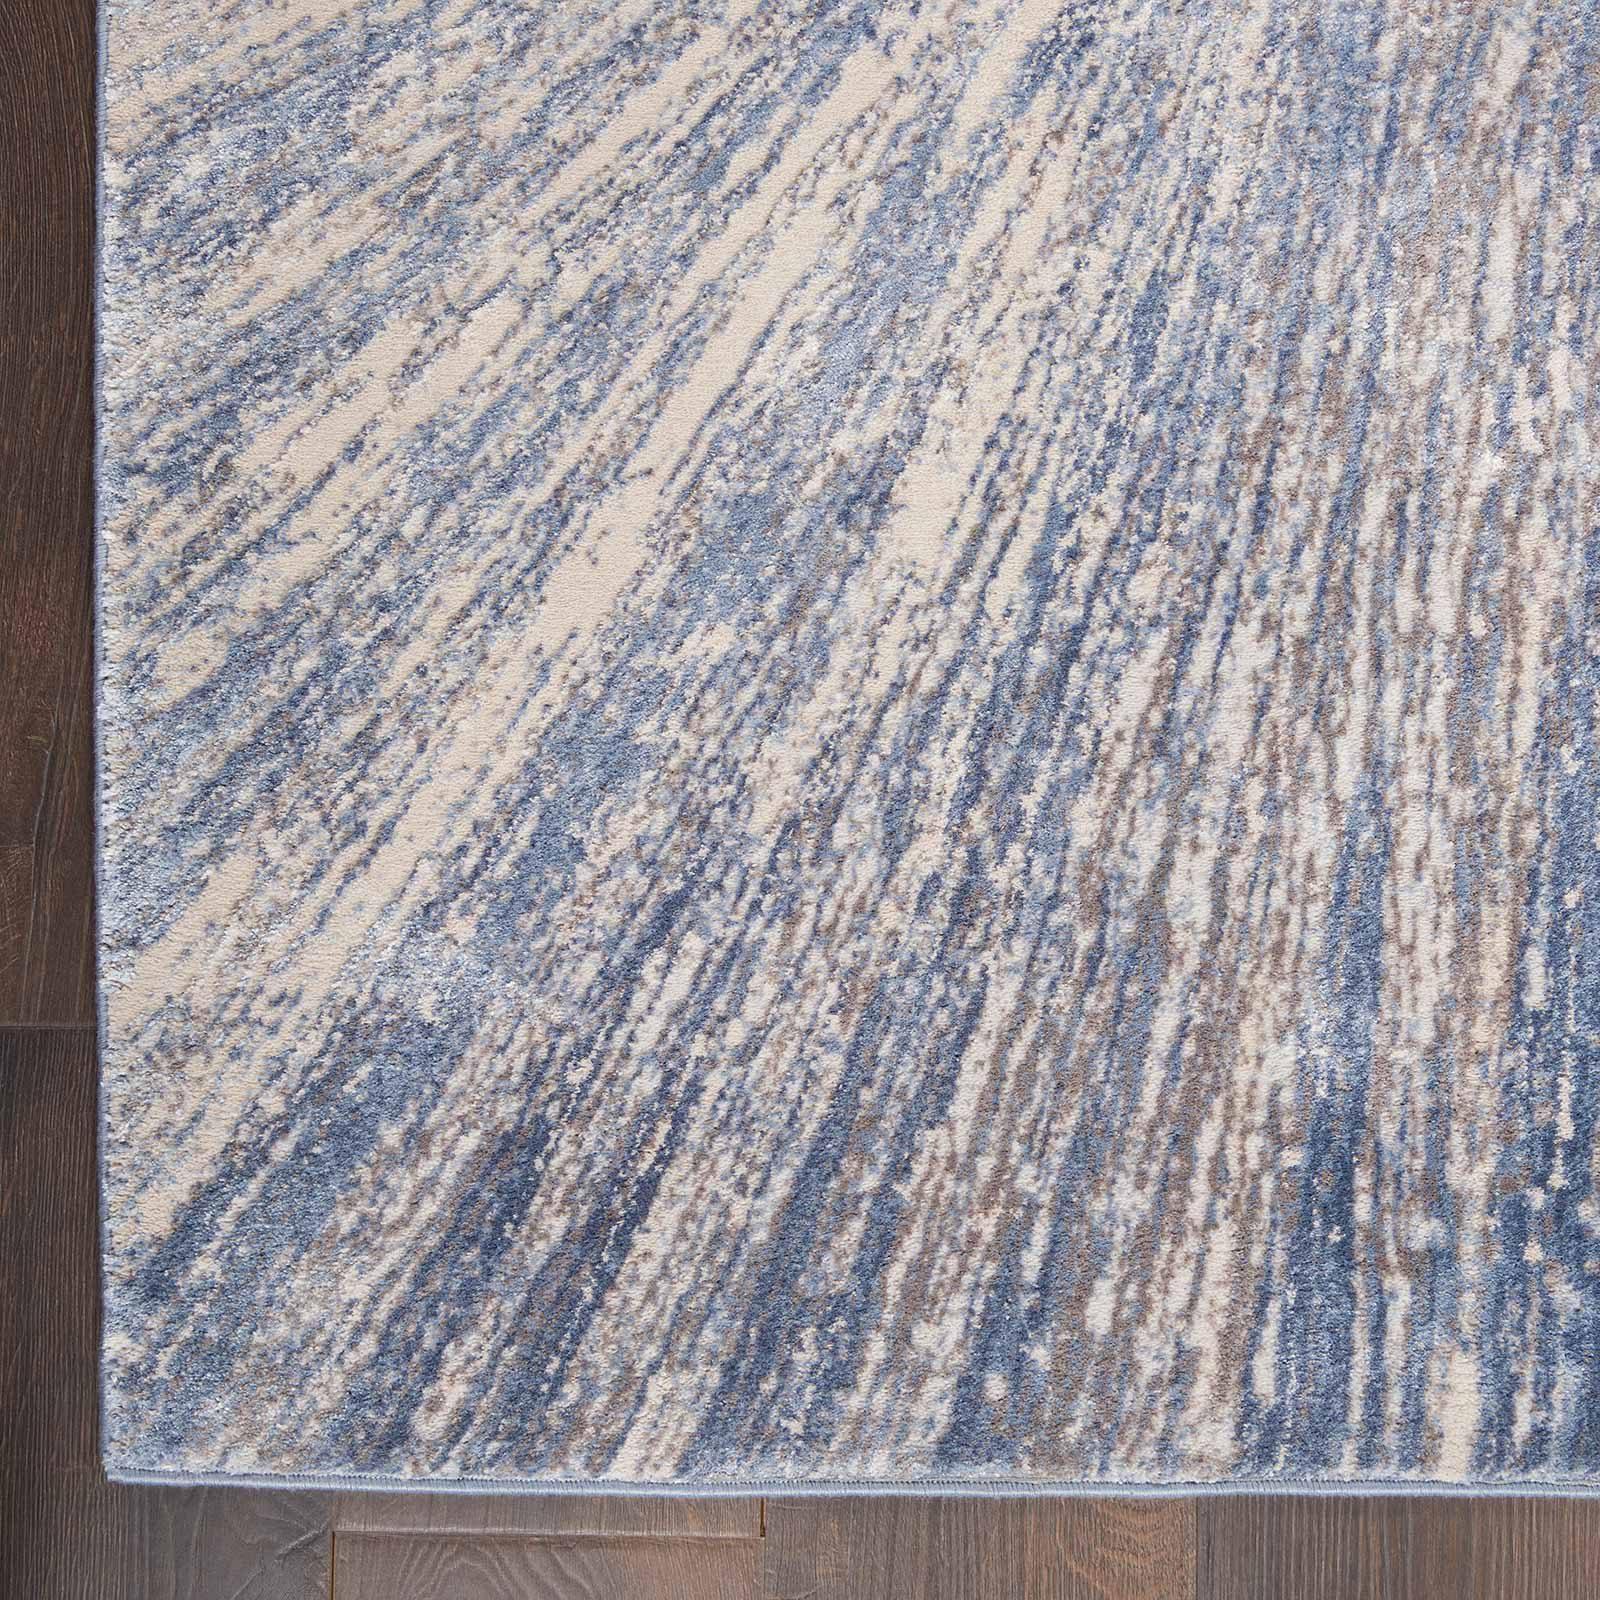 Nourison rug Silky Textures SLY05 BLUE GREY 5x7 099446710222 CR C